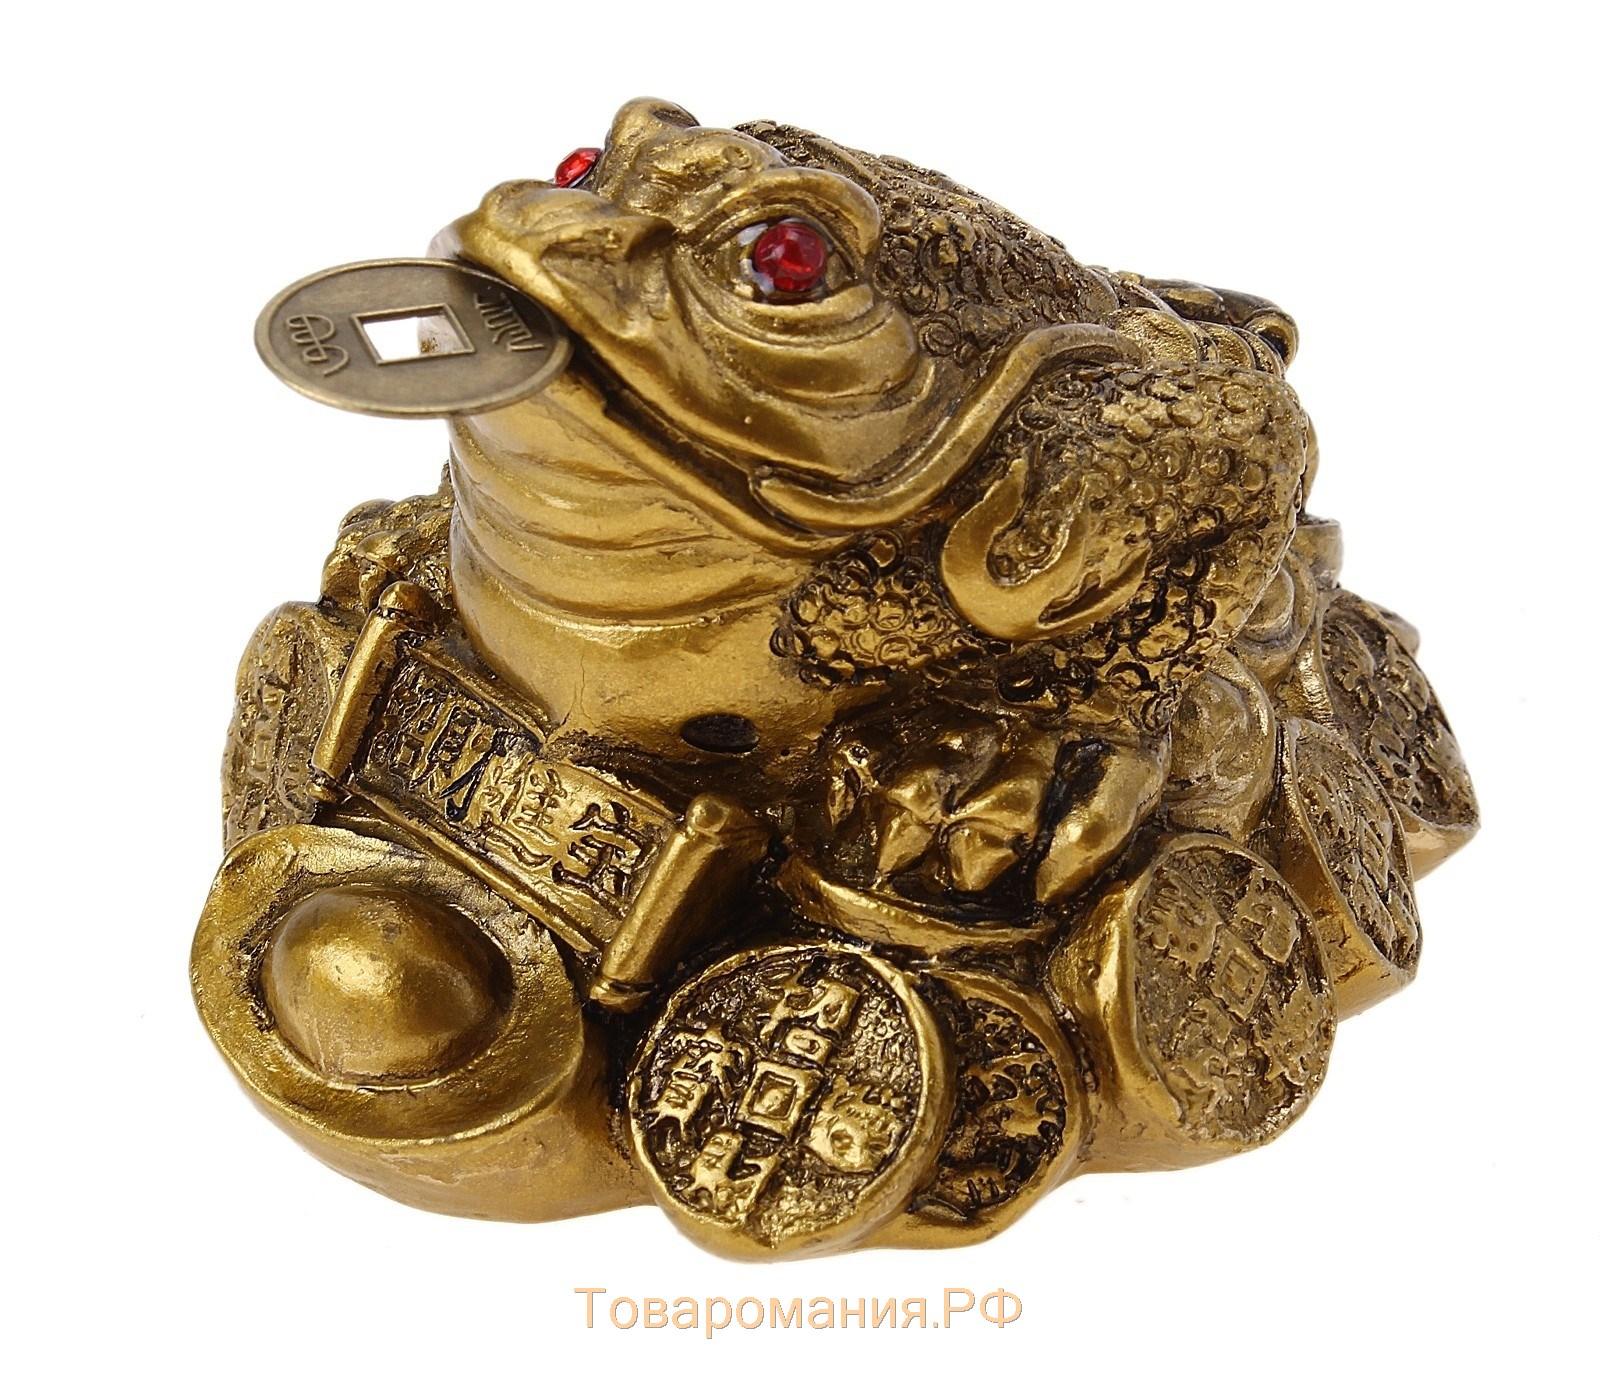 Жаба на куче монет и жемчуга (13 см)